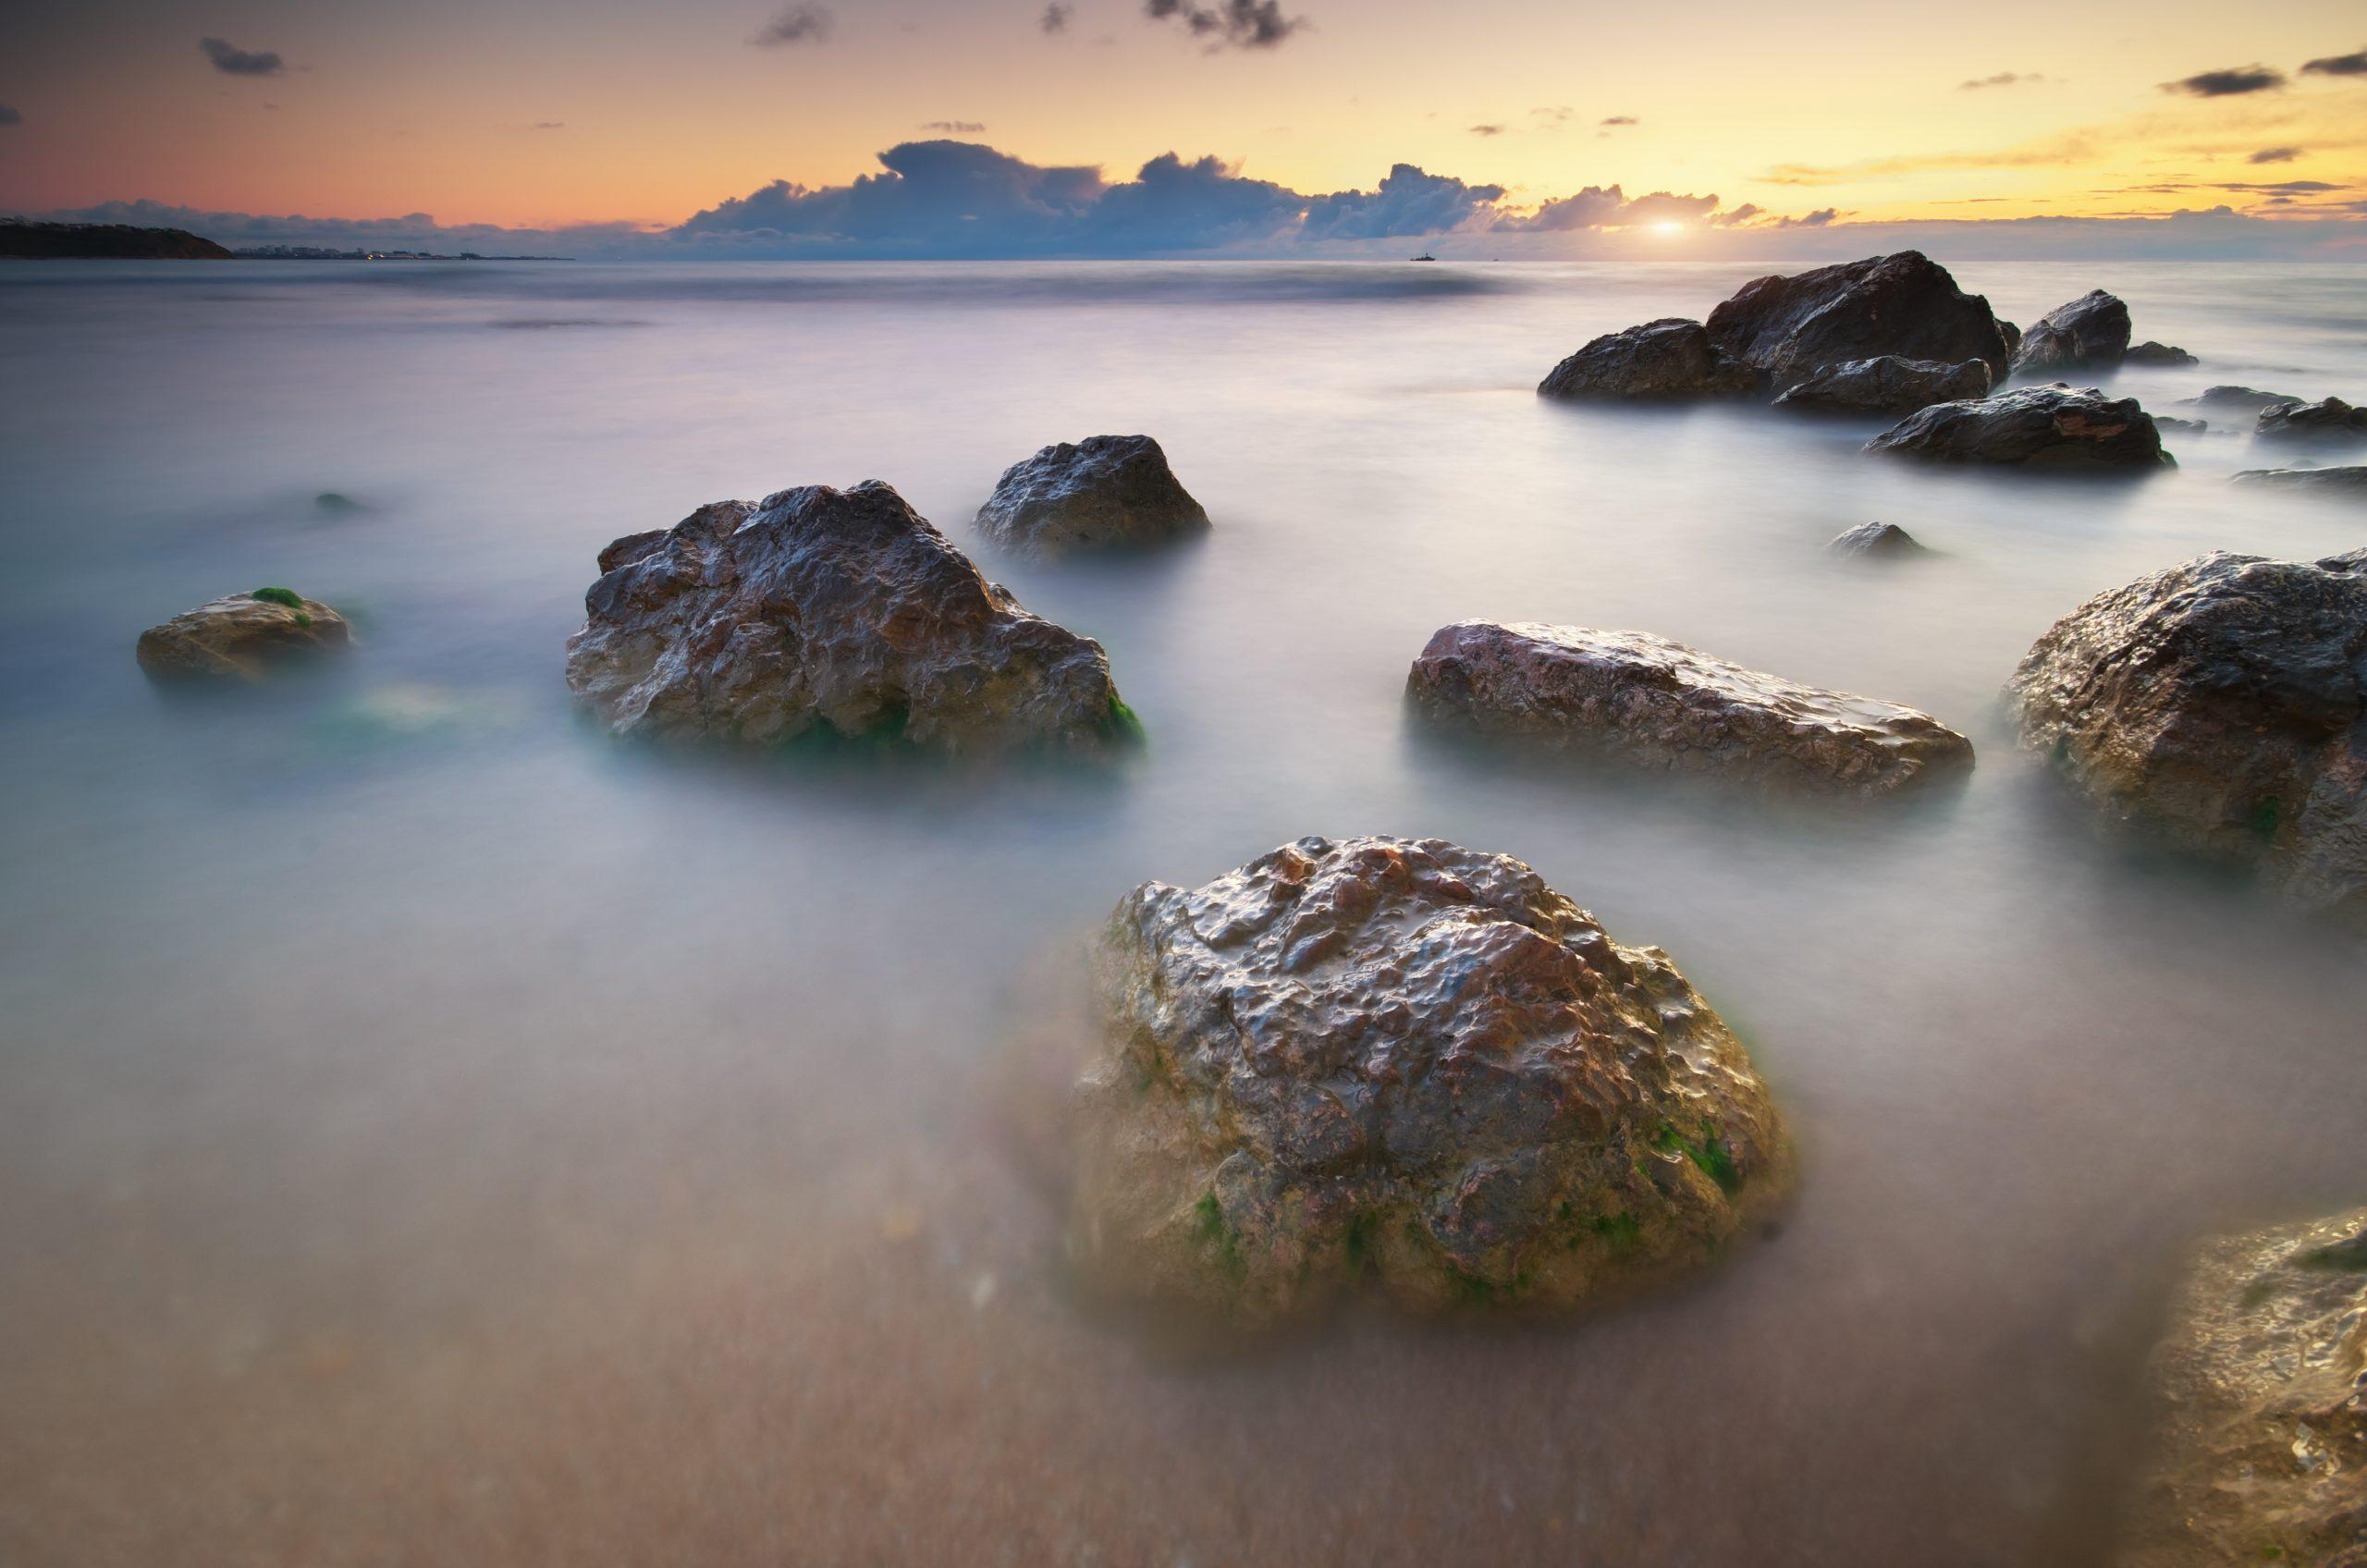 beautiful-seascape-nature-A956G38-scaled.jpg